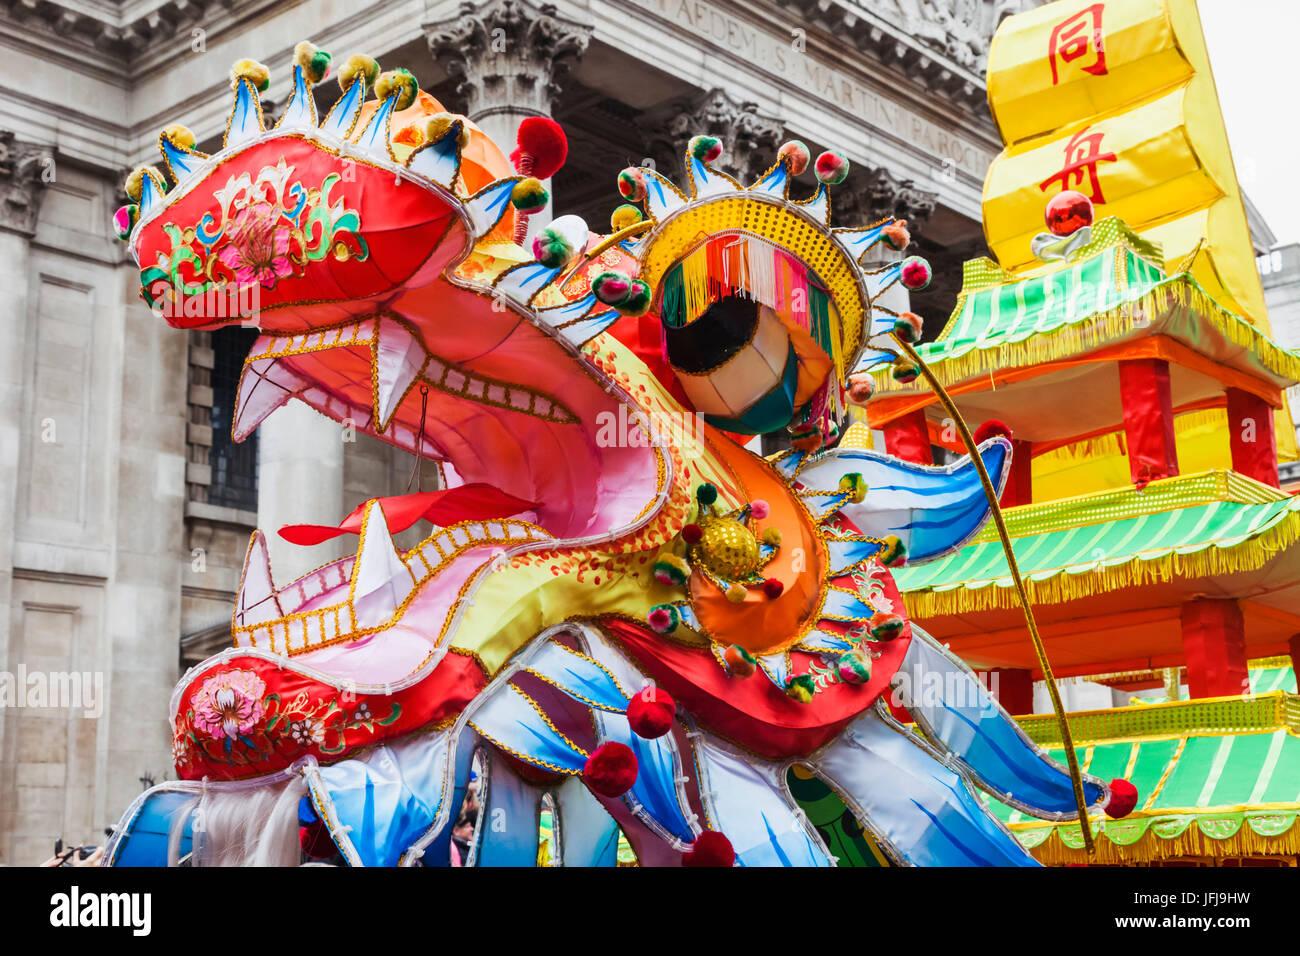 England, London, Chinese New Year Parade, Chinese Dragon - Stock Image